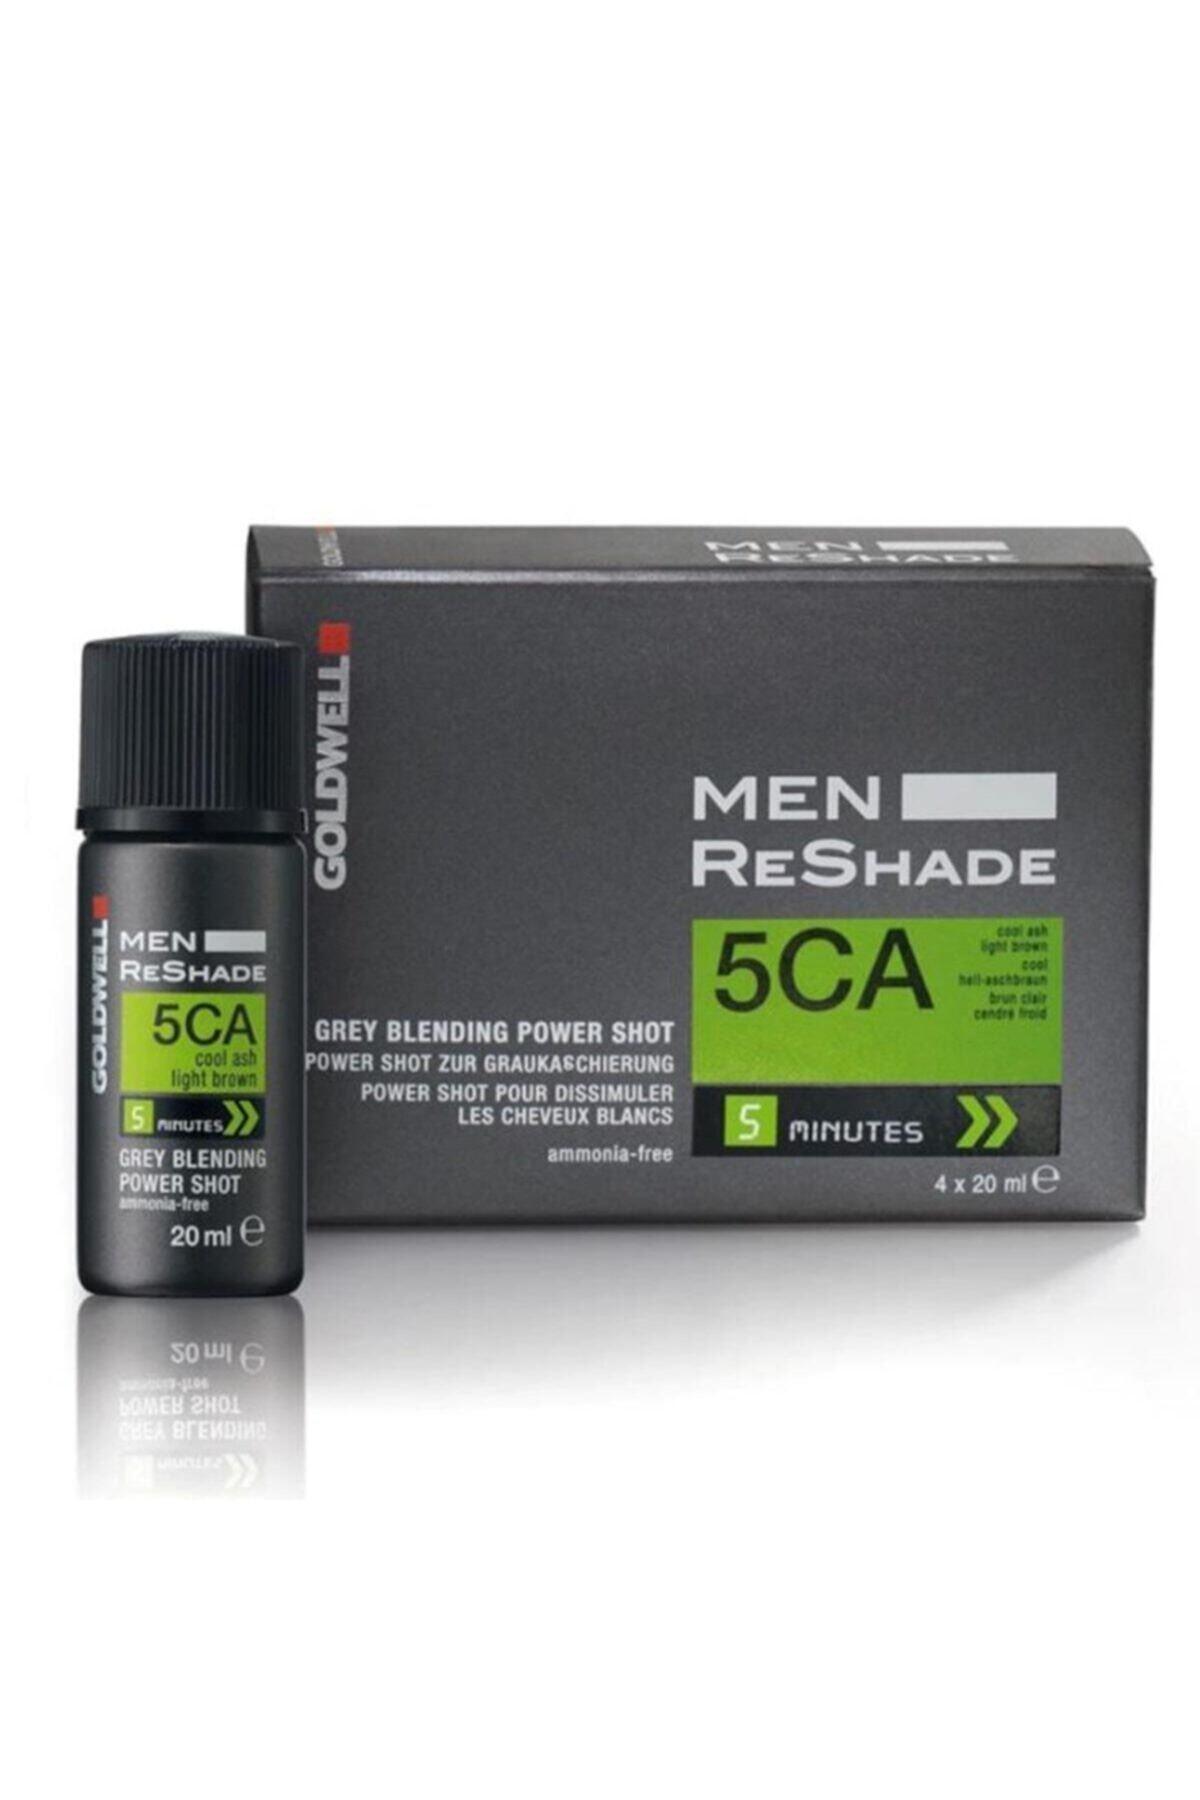 GOLDWELL Men Reshade 5ca Erkek Saç Boyası 1